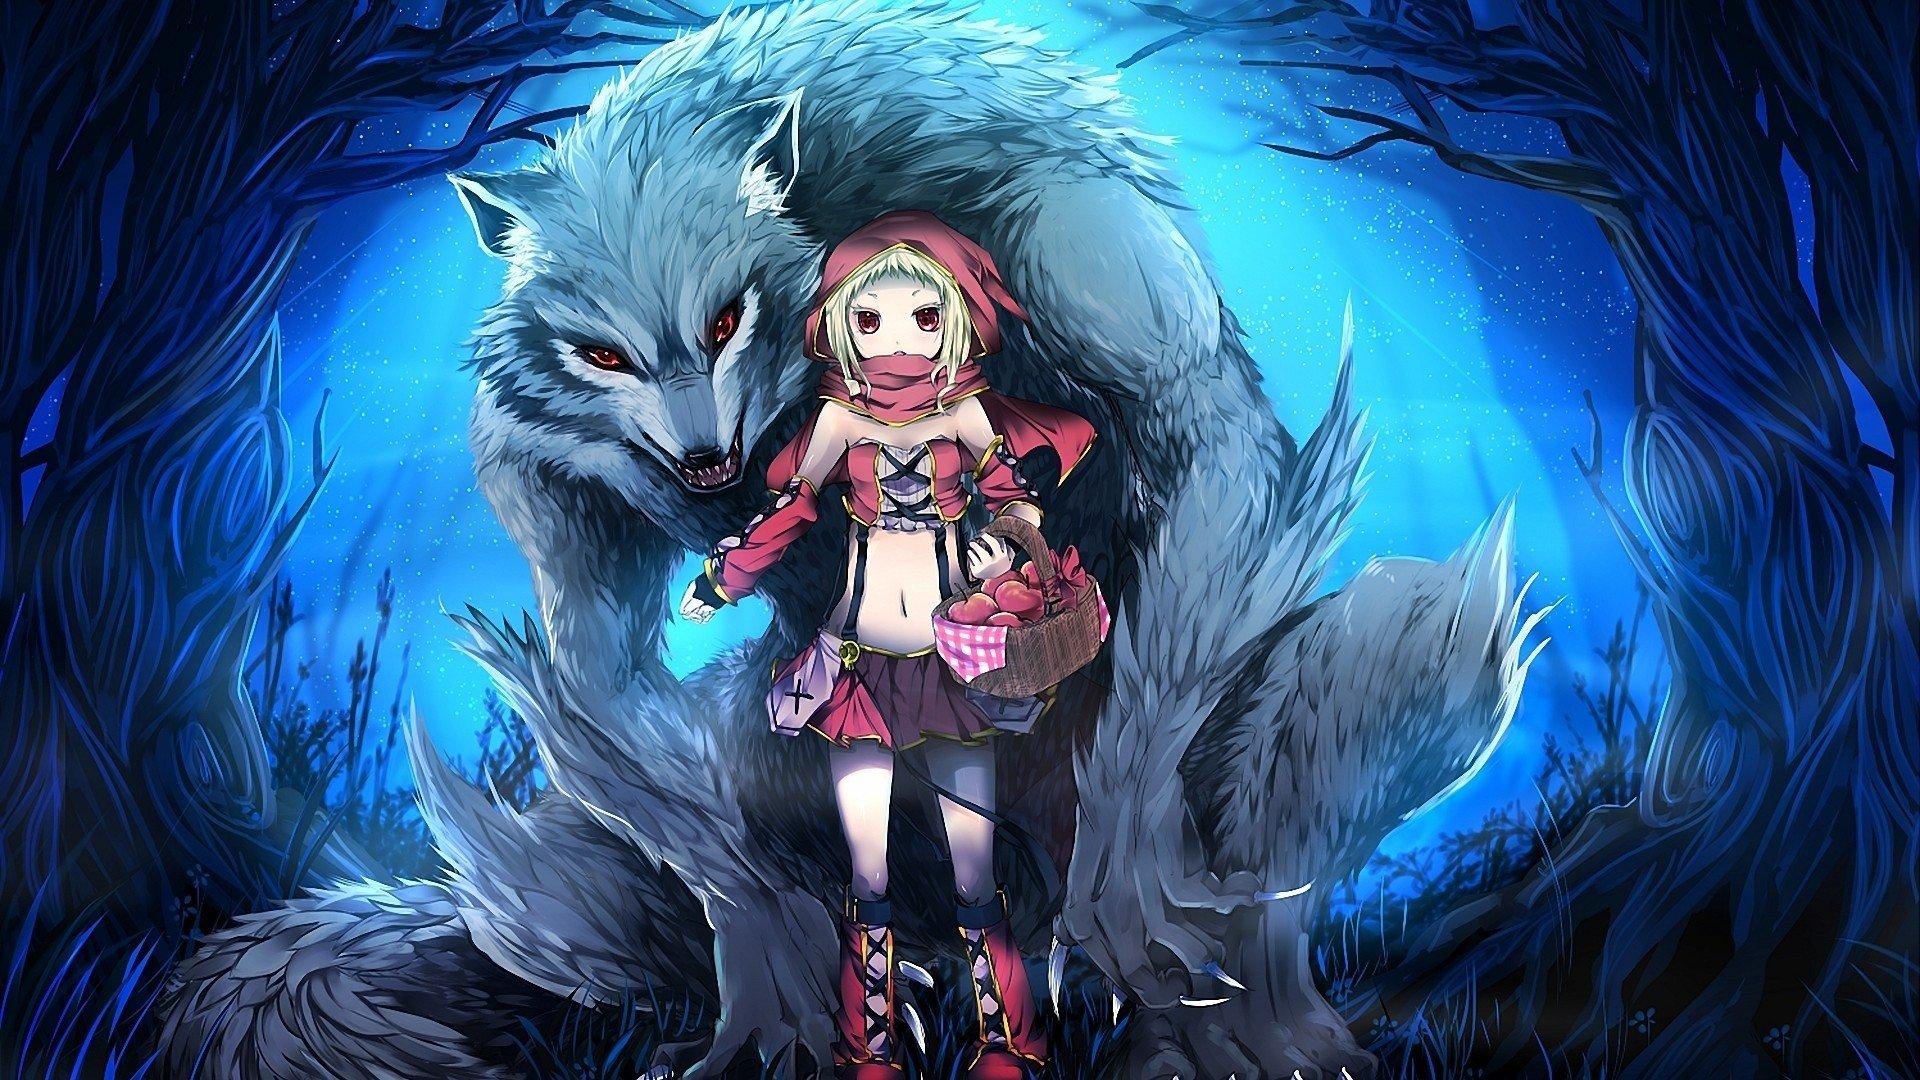 Anime Girls Werewolves Little Red Riding Hood Hd Wallpapers